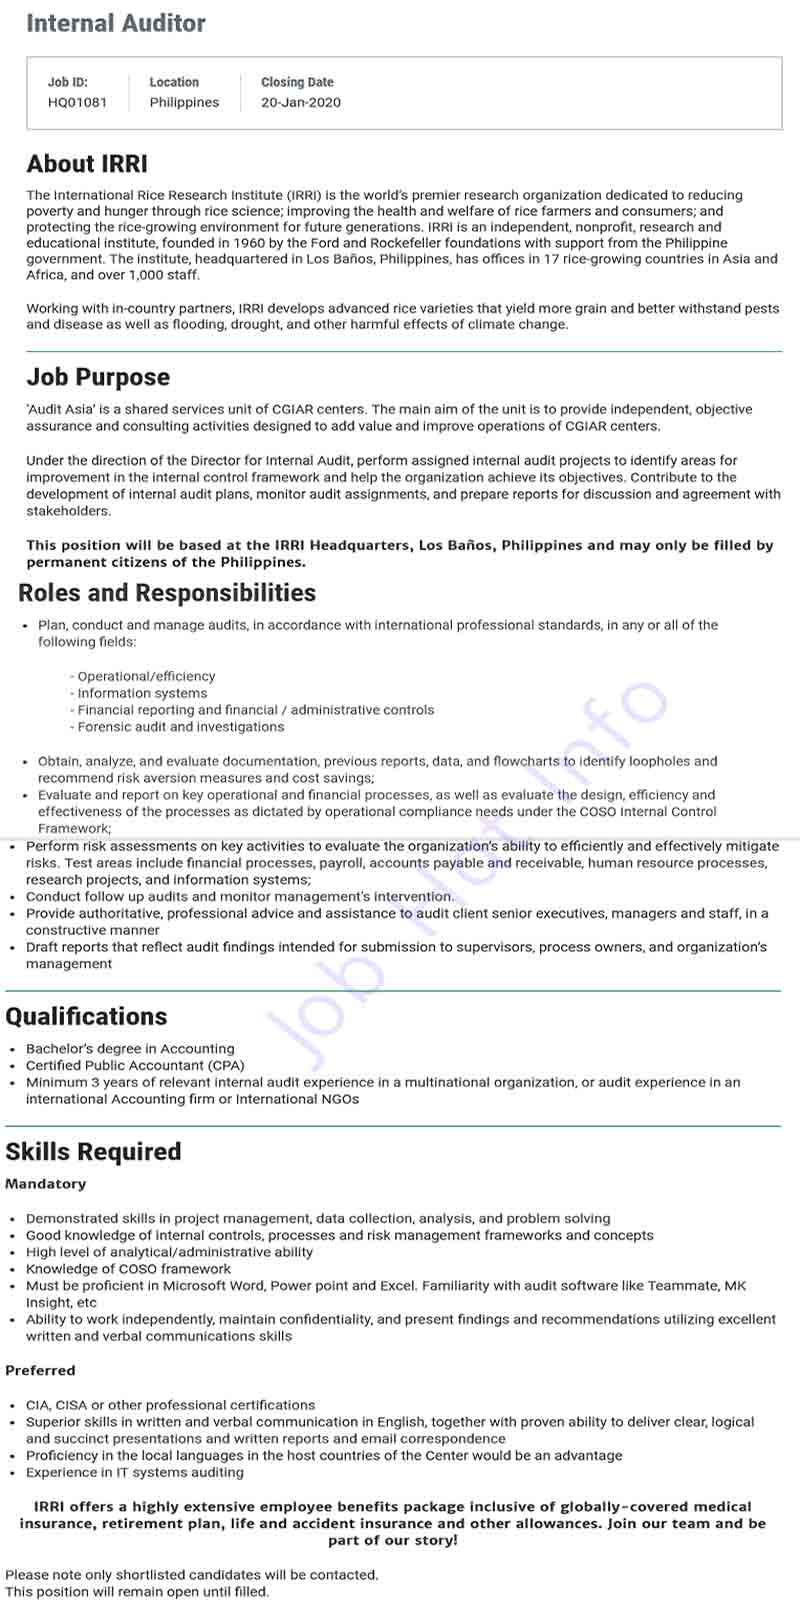 Internal Auditor Job at IRRI (Philippine) 1